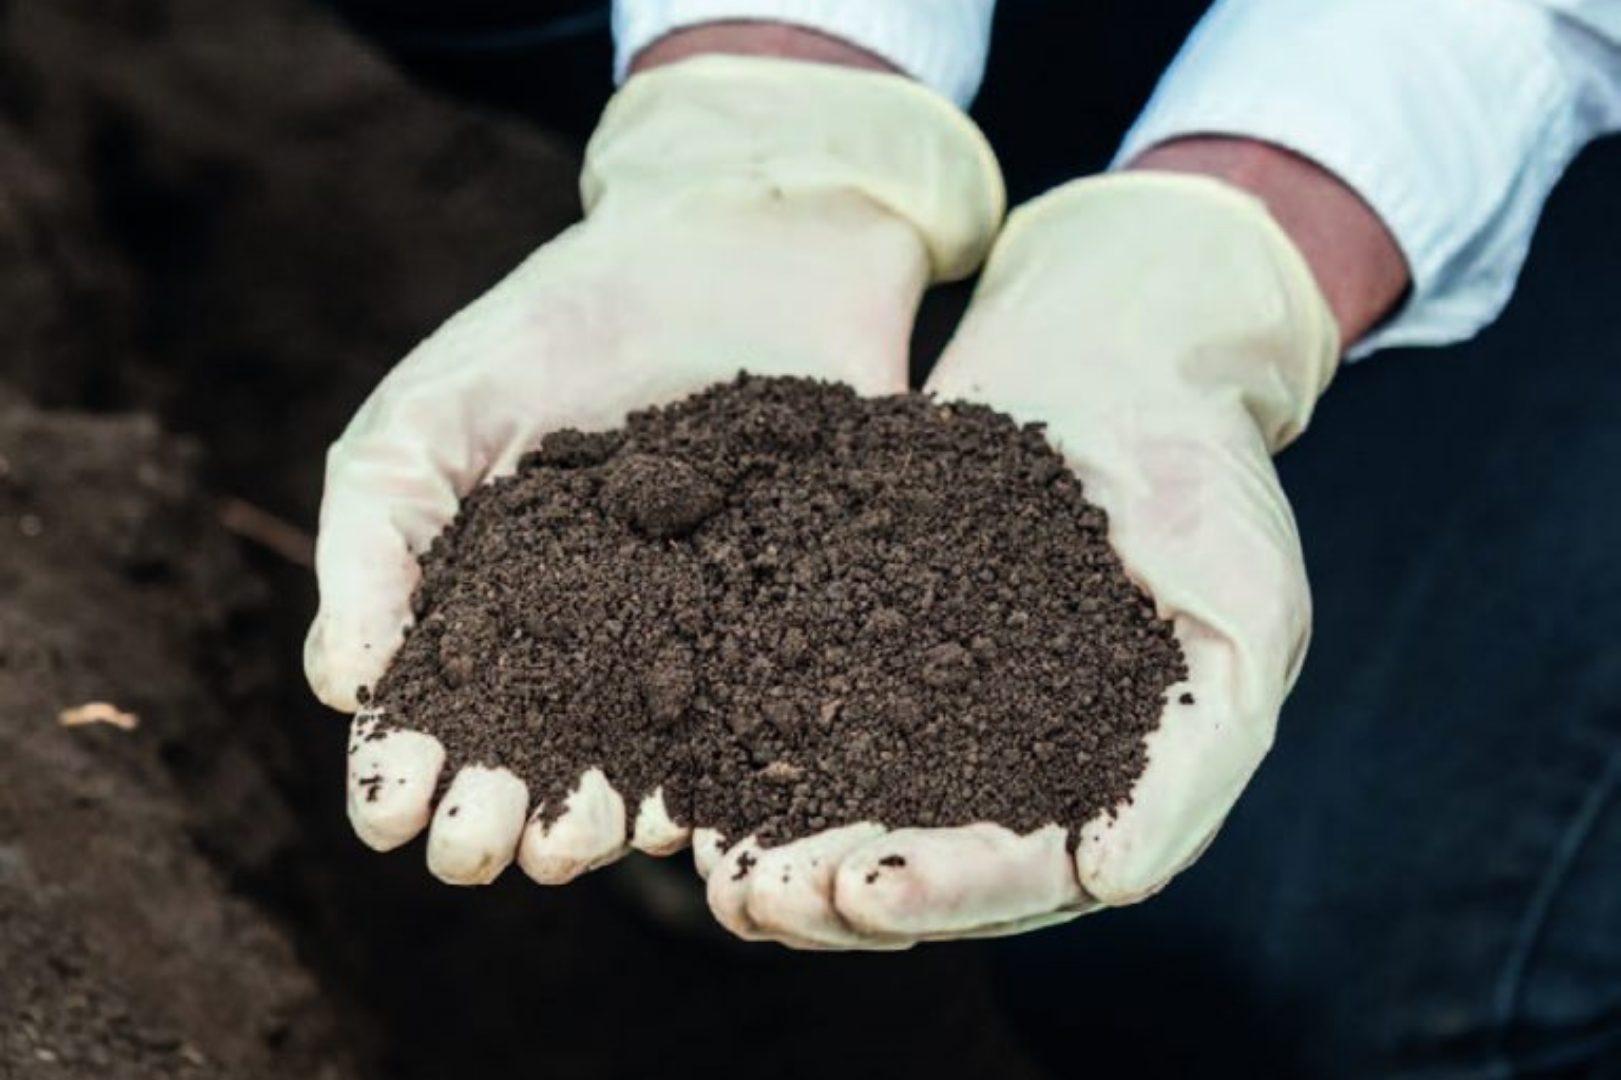 Soil testing professional